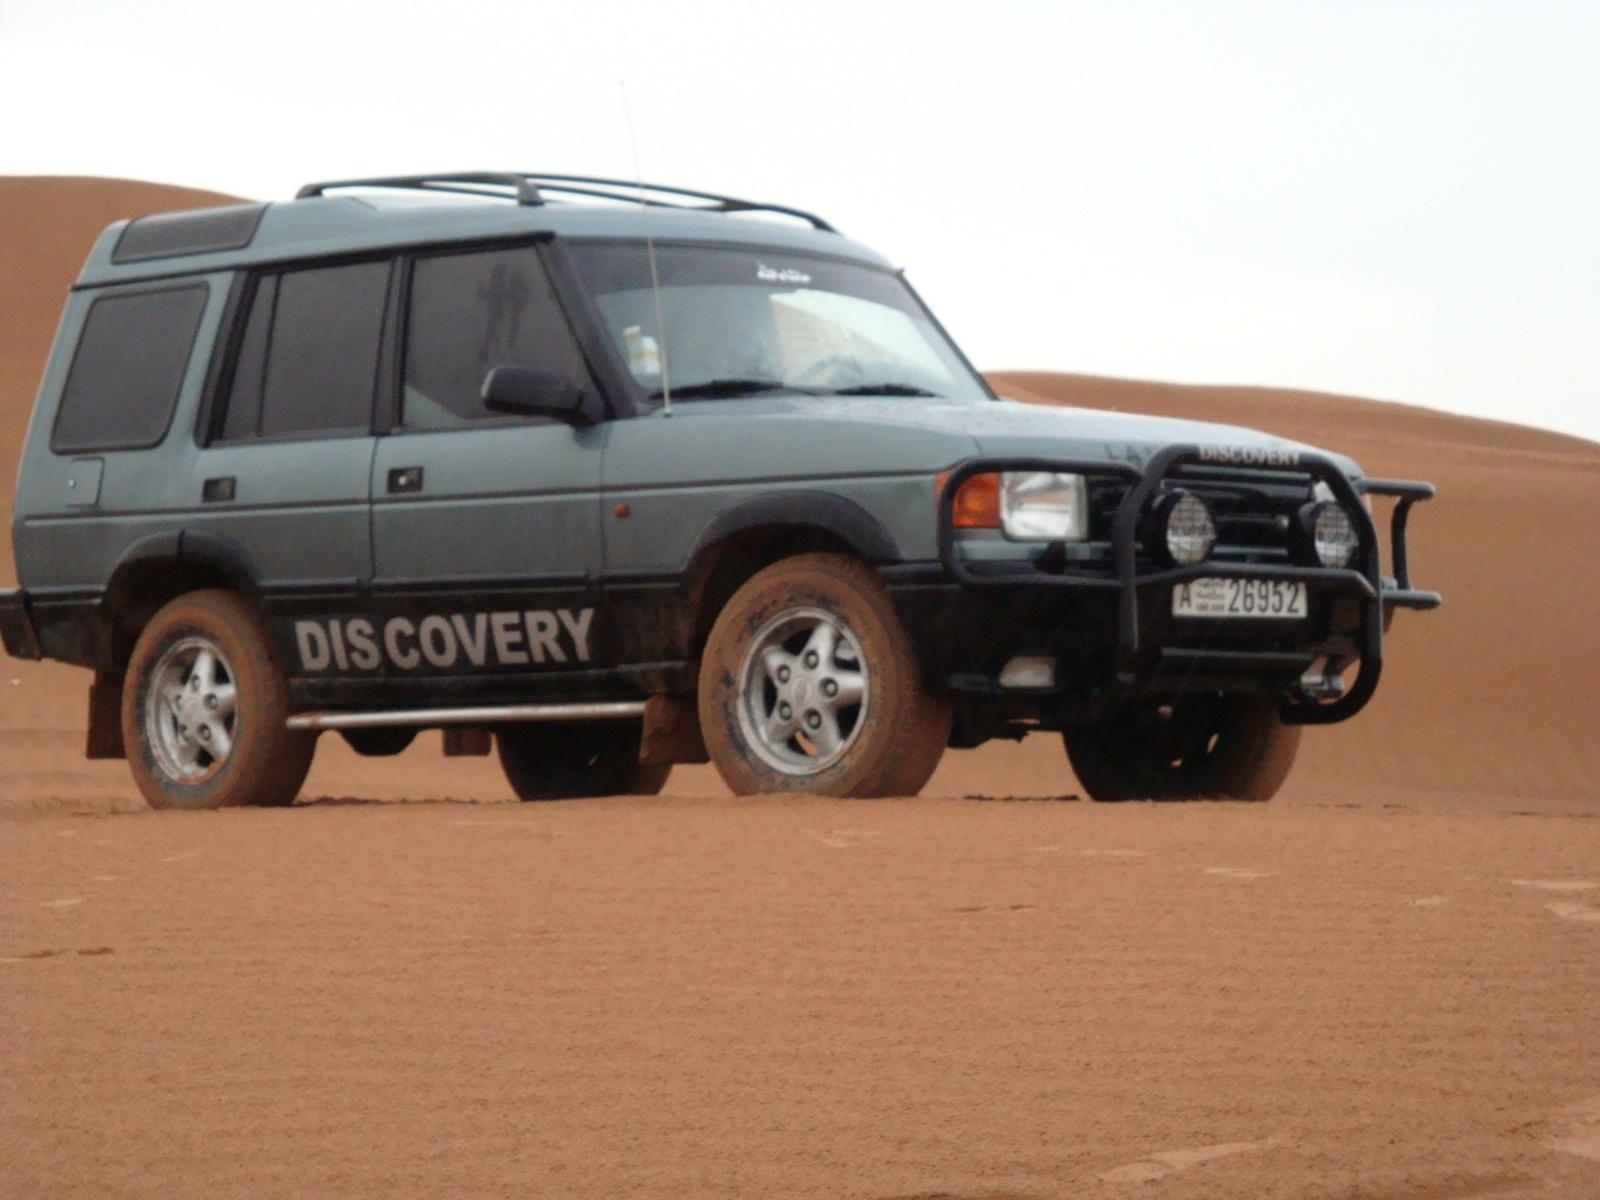 1995 Land Rover Range Rover User Reviews CarGurus